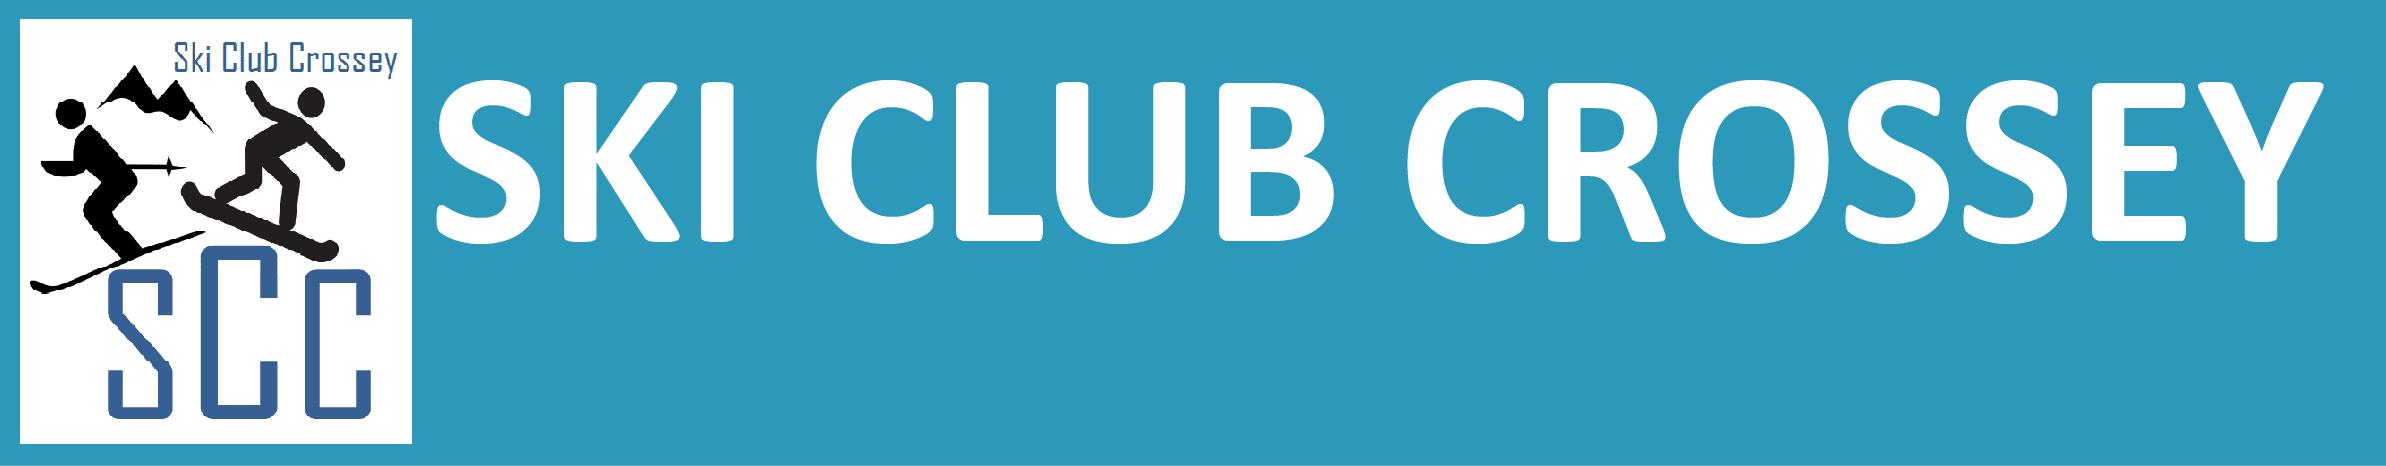 Ski Club Crossey